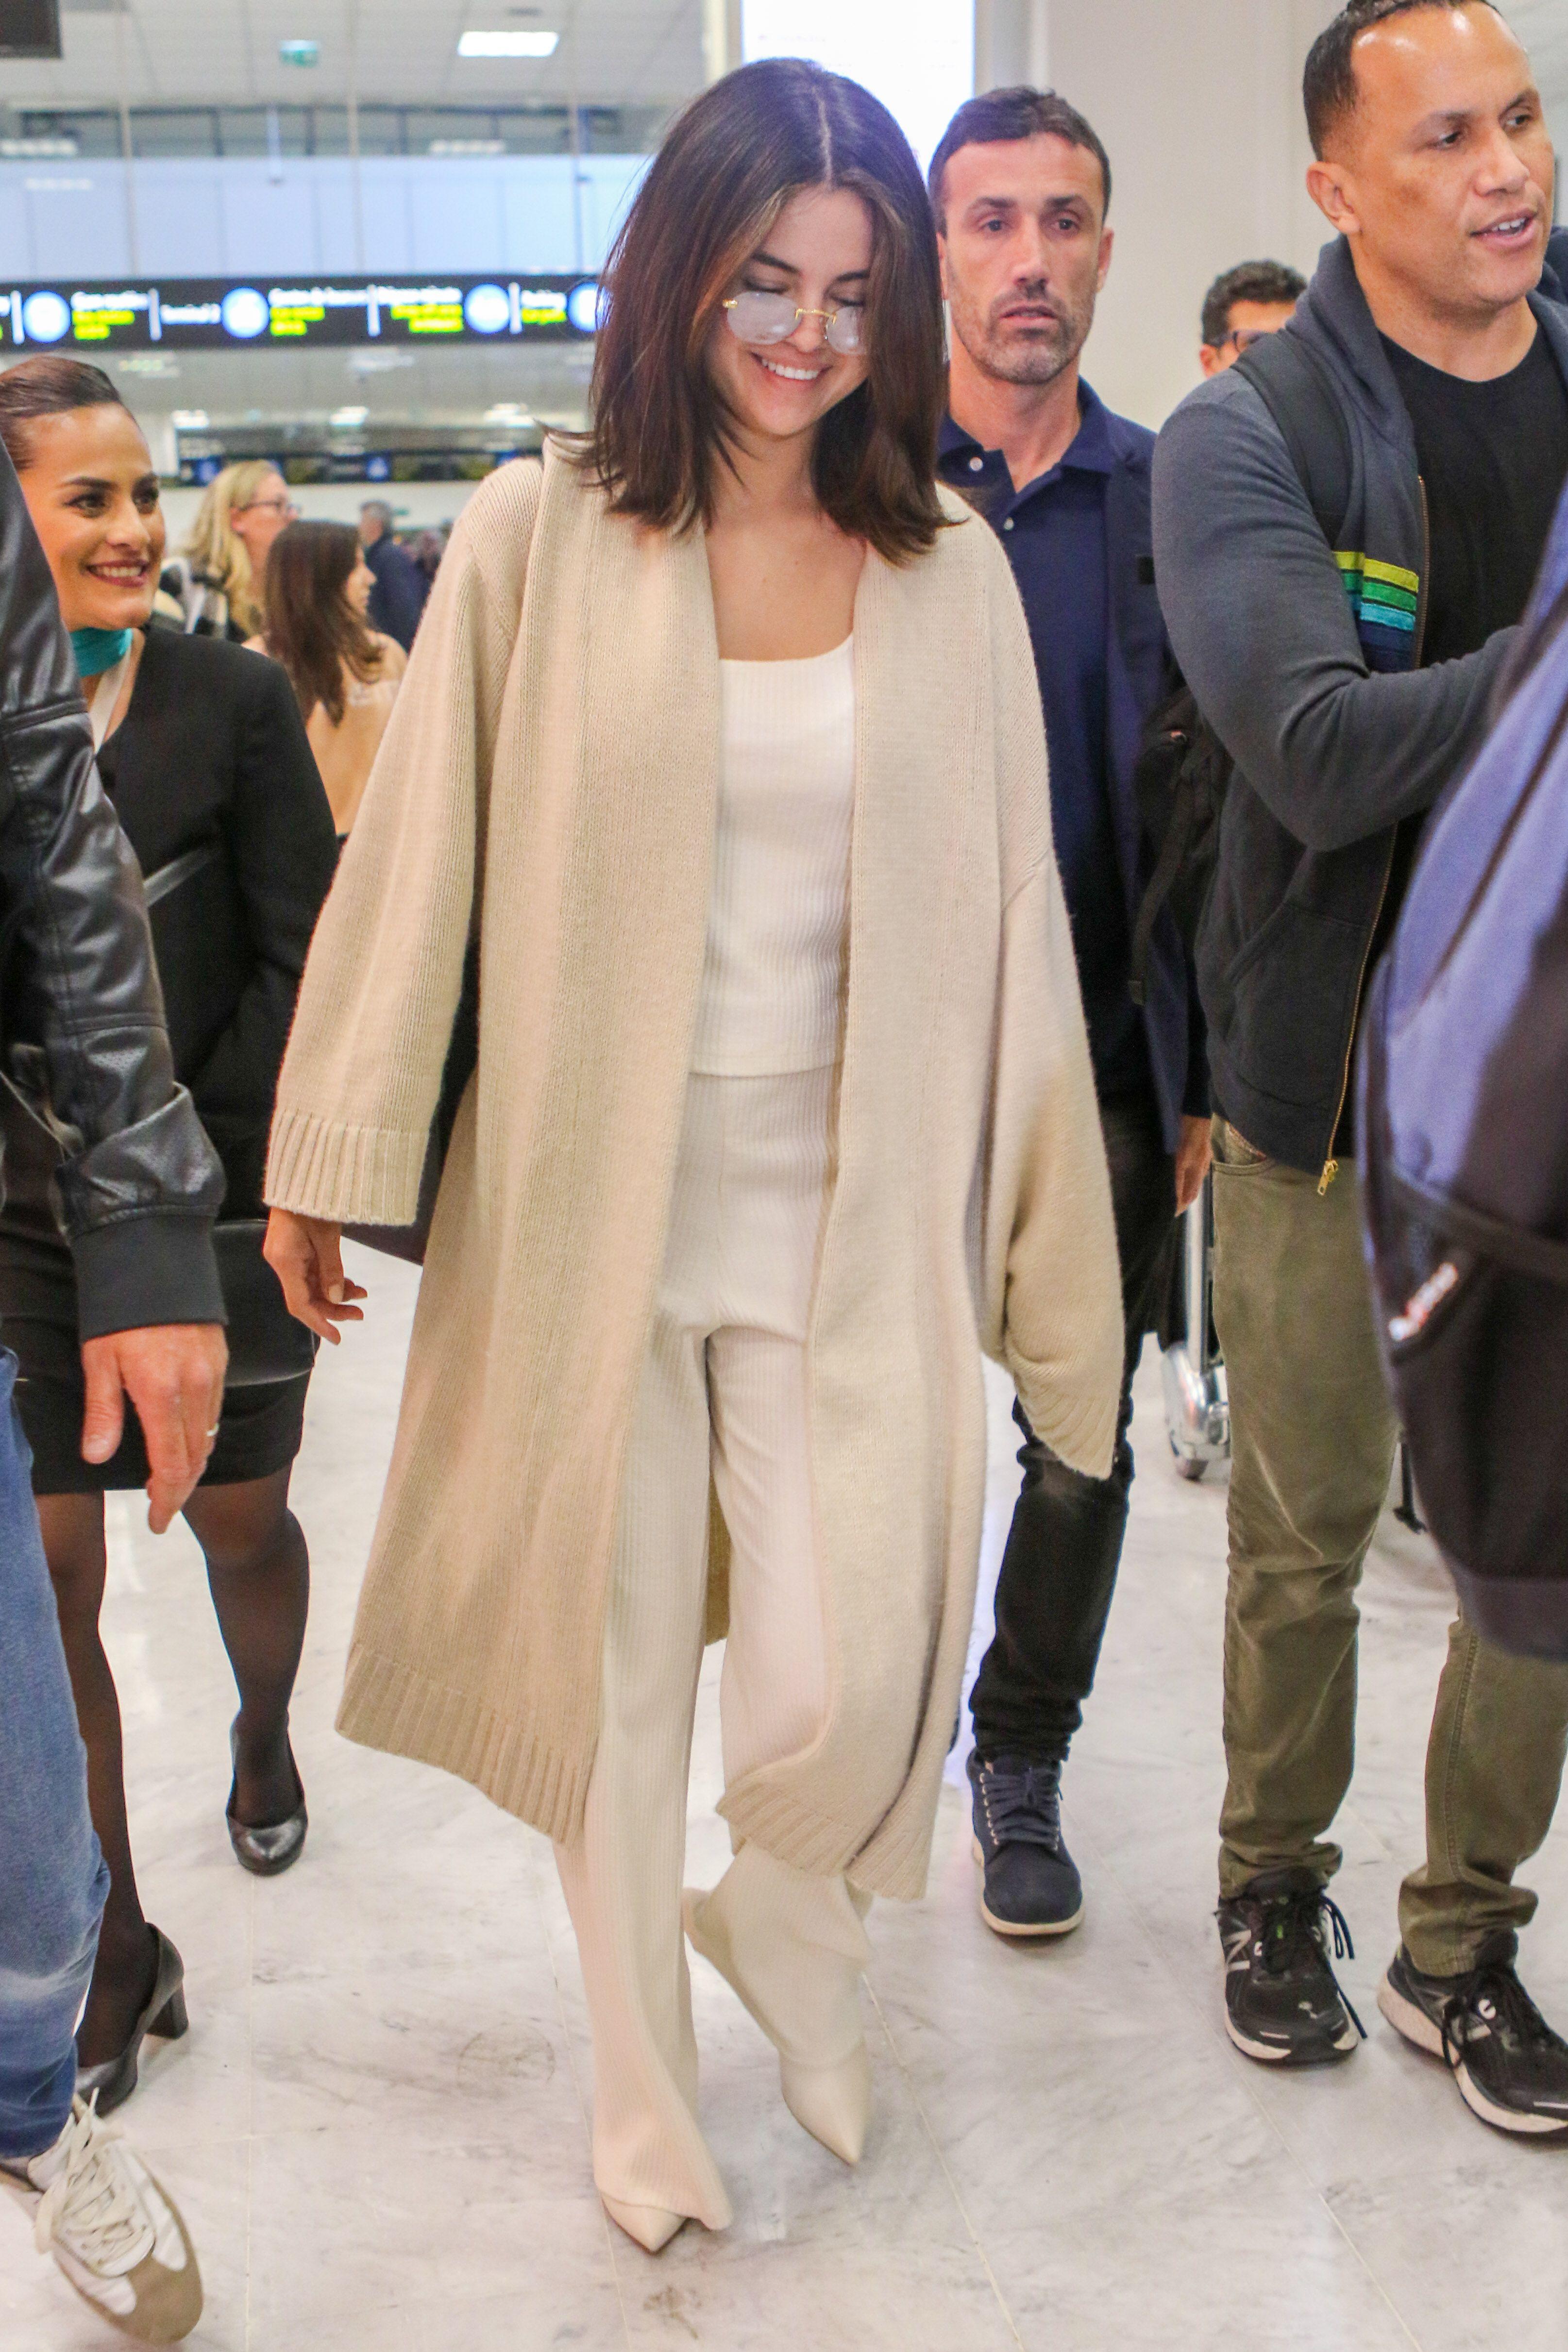 Selena Gomez Wore the Coziest Cream Cardigan to Travel to Nice, France